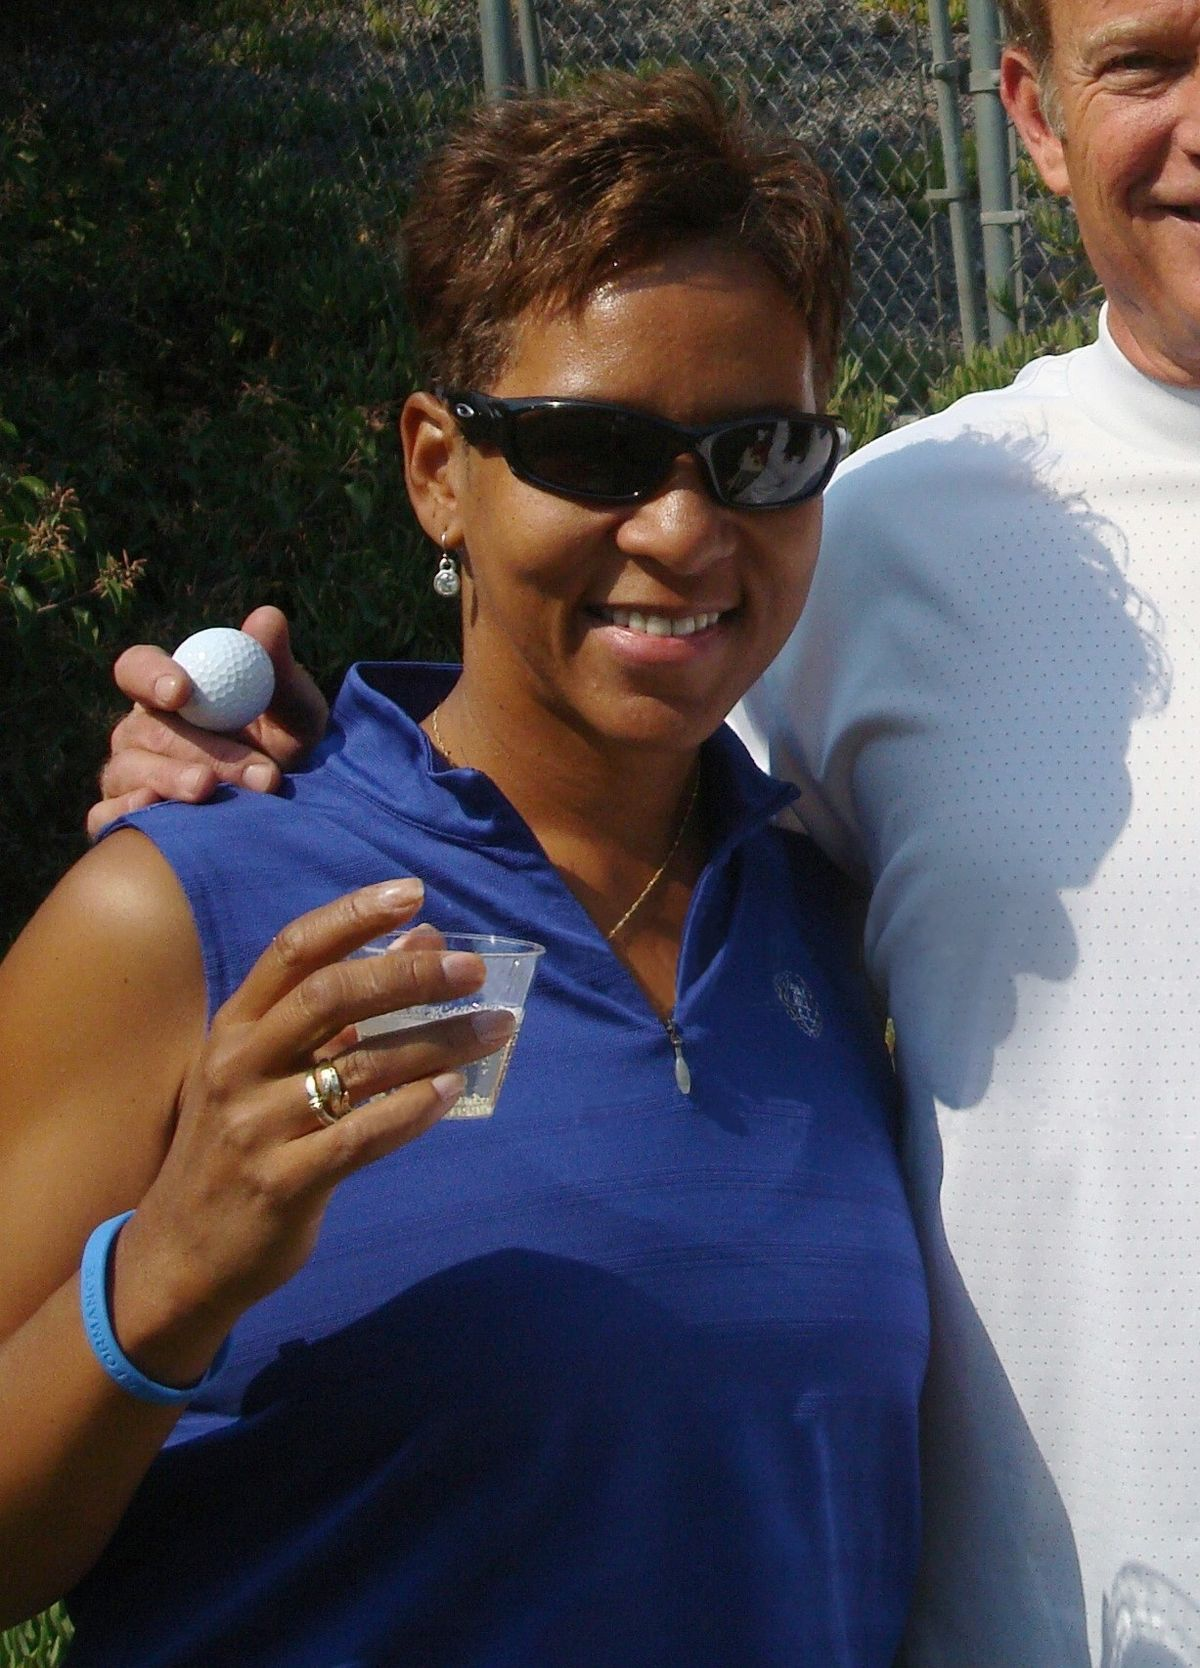 Дилион харпер на теннисном корте фото 267-781